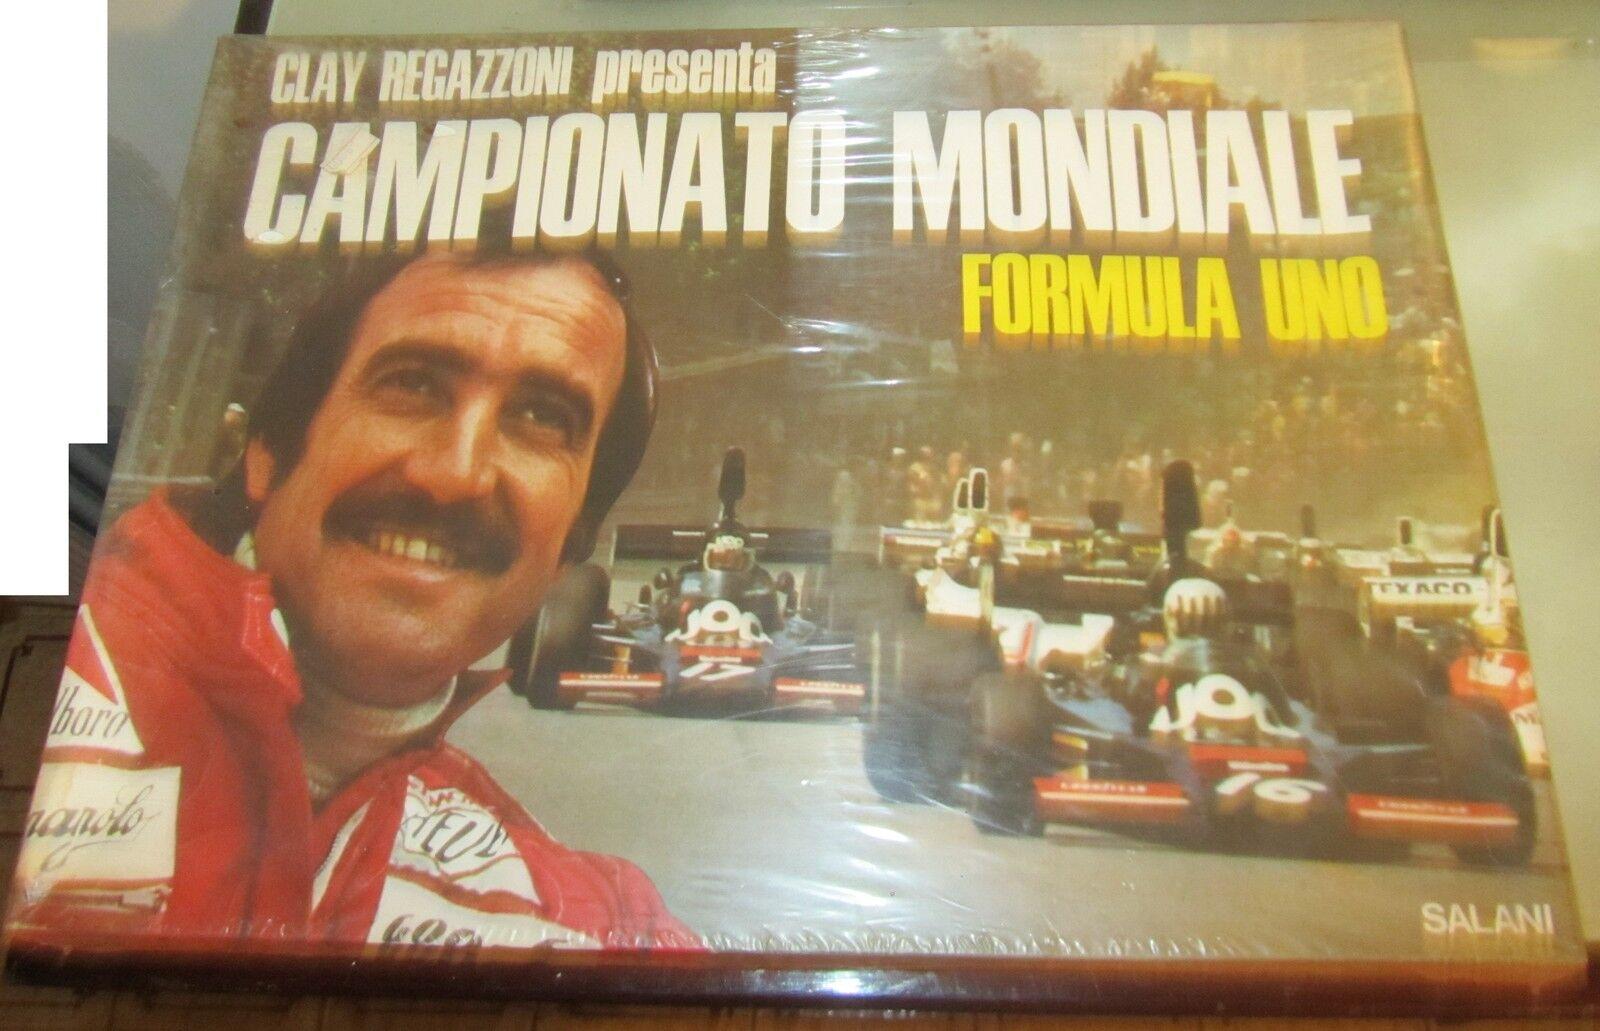 CLAY REGAZZONI presenta Campionato Mondiale FORMULA 1 Salani Uno vintage 1975